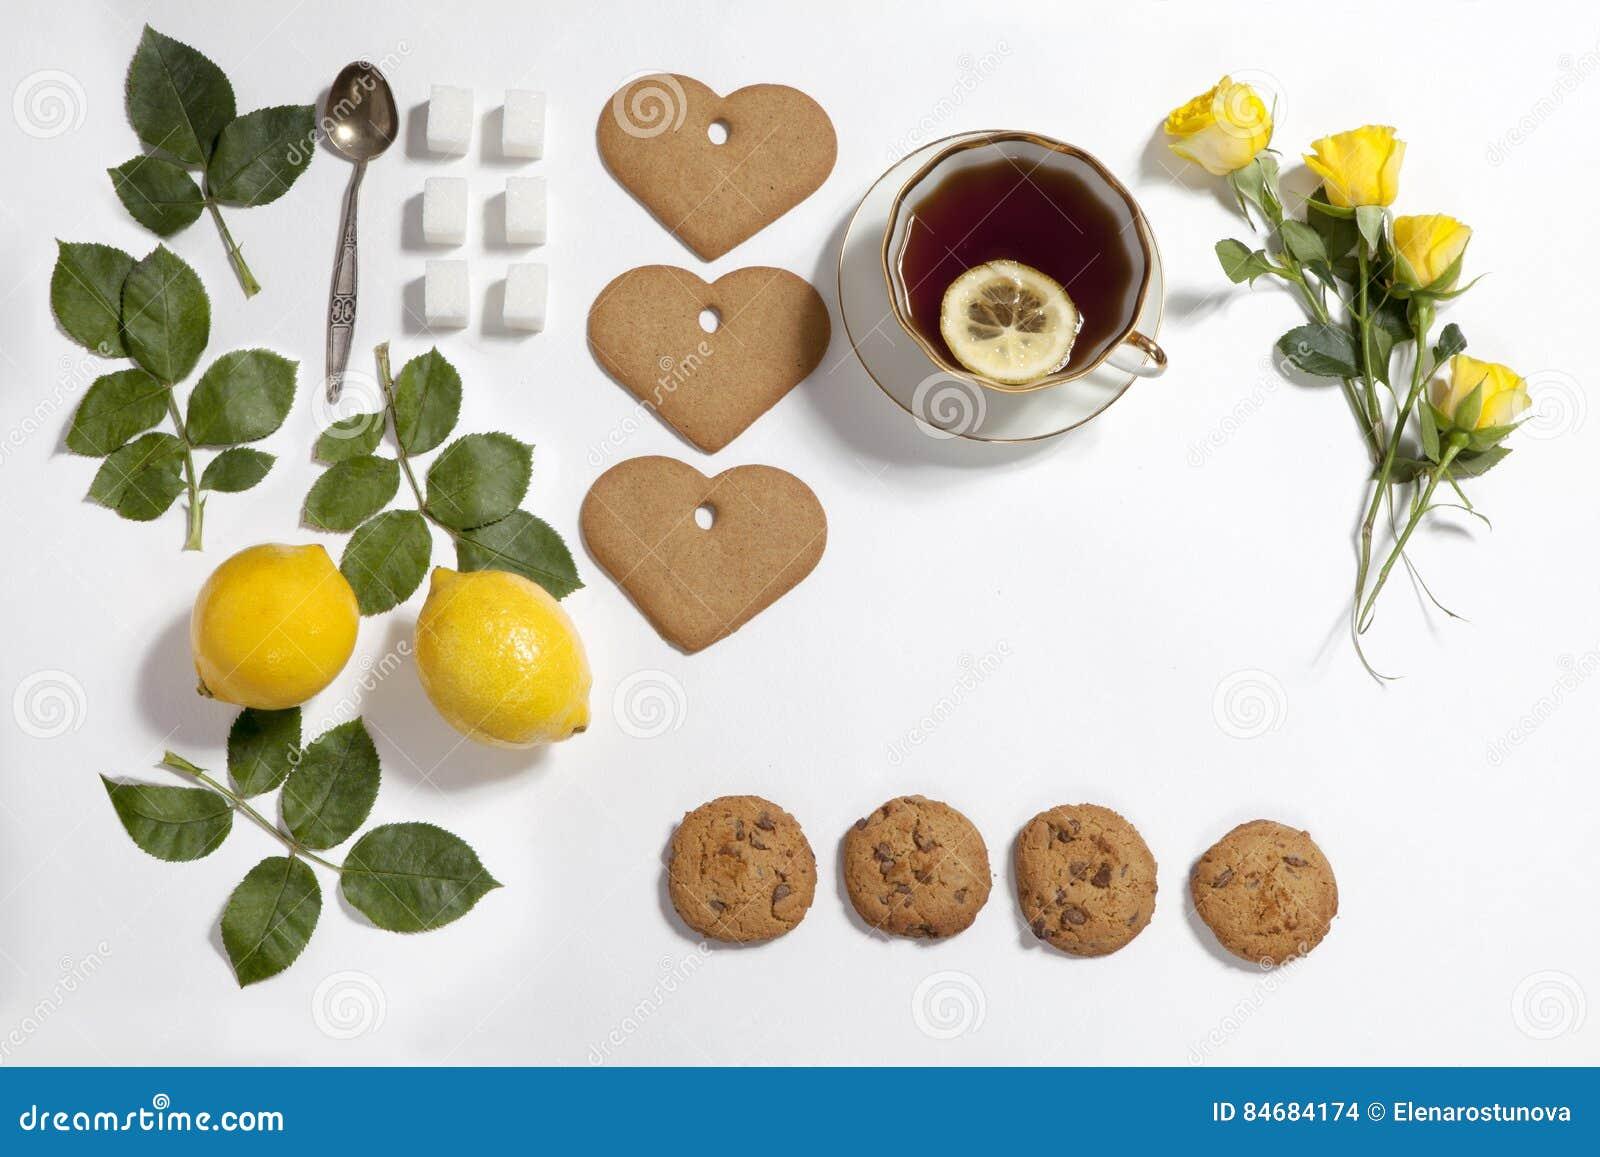 photo Lemon Ornament Cookies